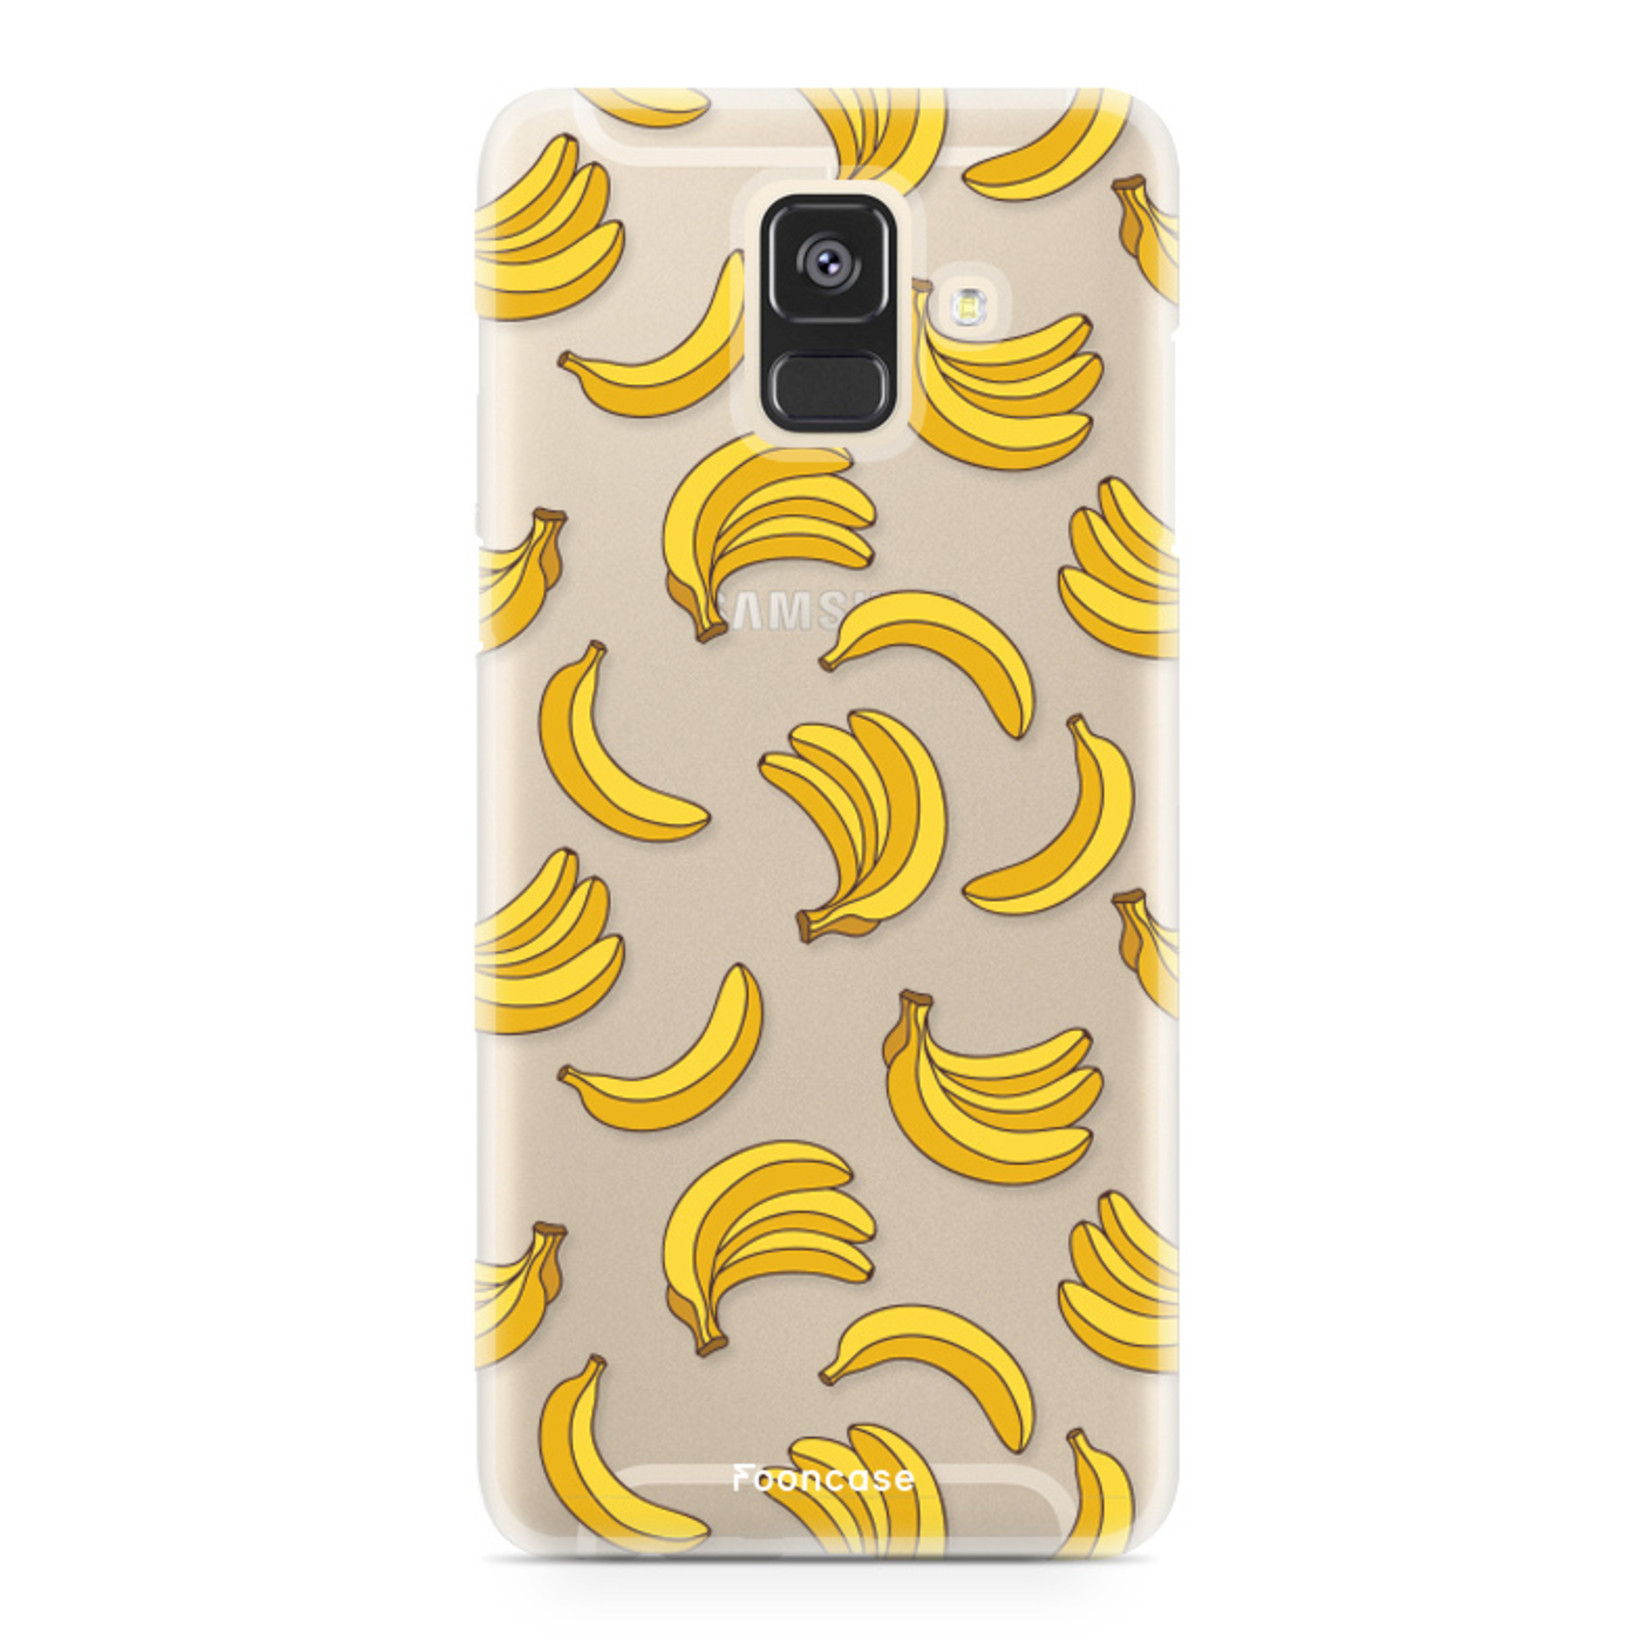 FOONCASE Samsung Galaxy A6 2018 hoesje TPU Soft Case - Back Cover - Bananas / Banaan / Bananen